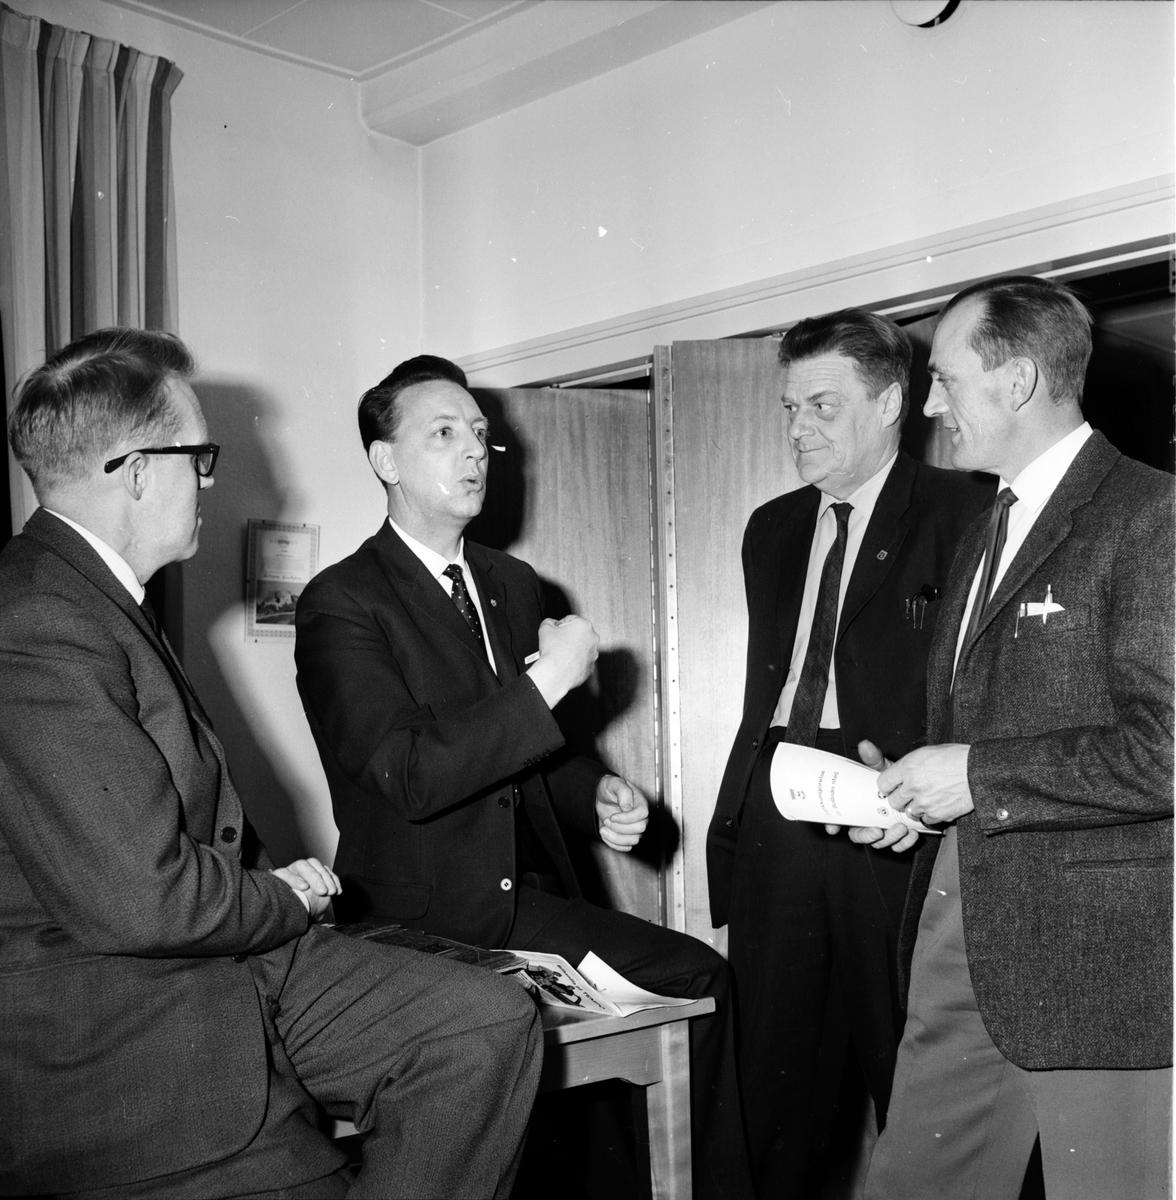 Trafikmöte i Bollnäs, Grenholm, Jegerfalk, Bergman, Sundström, 8 Mars 1966